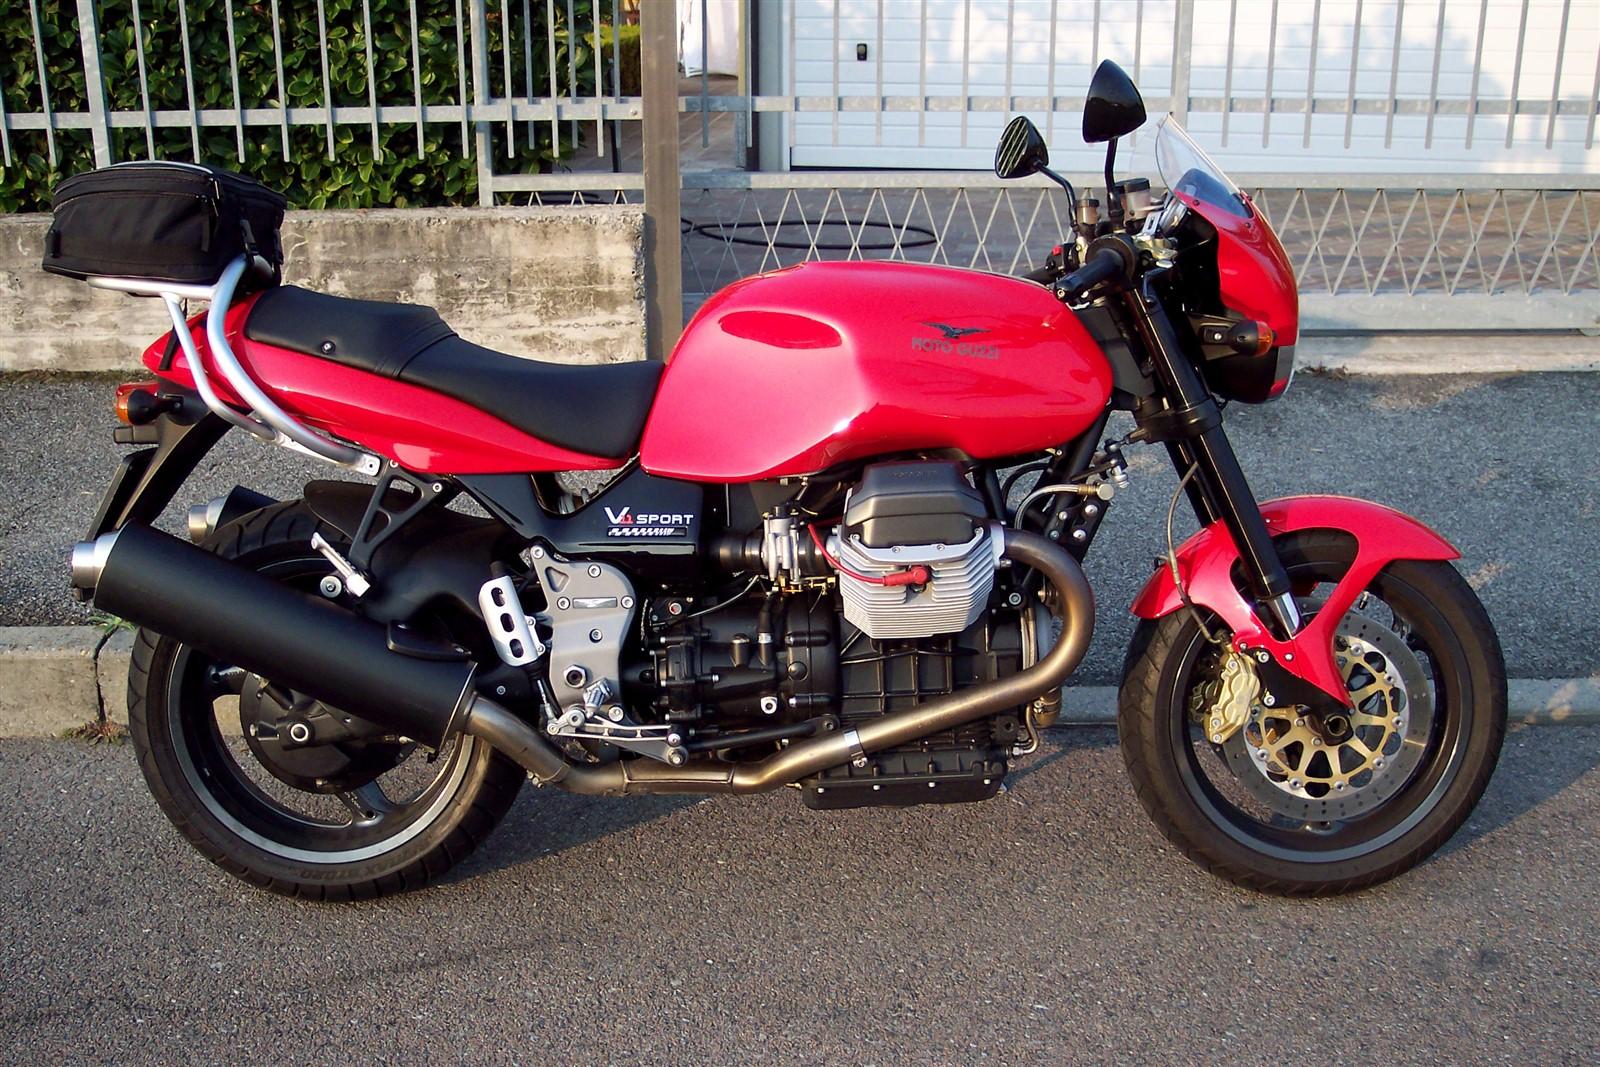 Moto Guzzi V11 Sport-8 - a photo on Flickriver